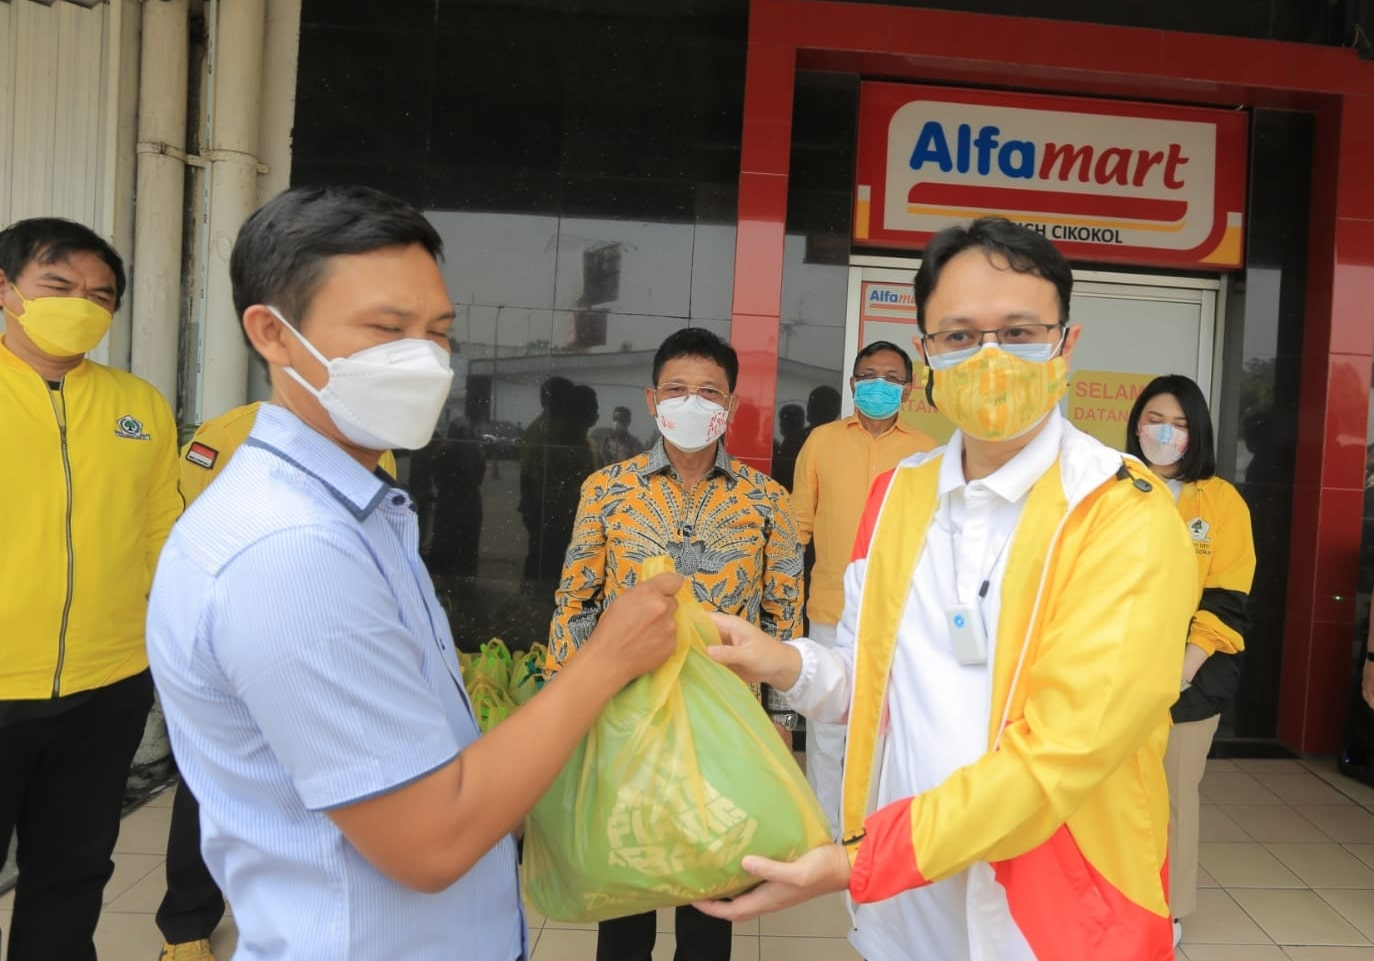 Gandeng APRINDO, Balitbang Golkar Sebar Ribuan Bansos Untuk Warga Isoman di Tangerang-Bekasi